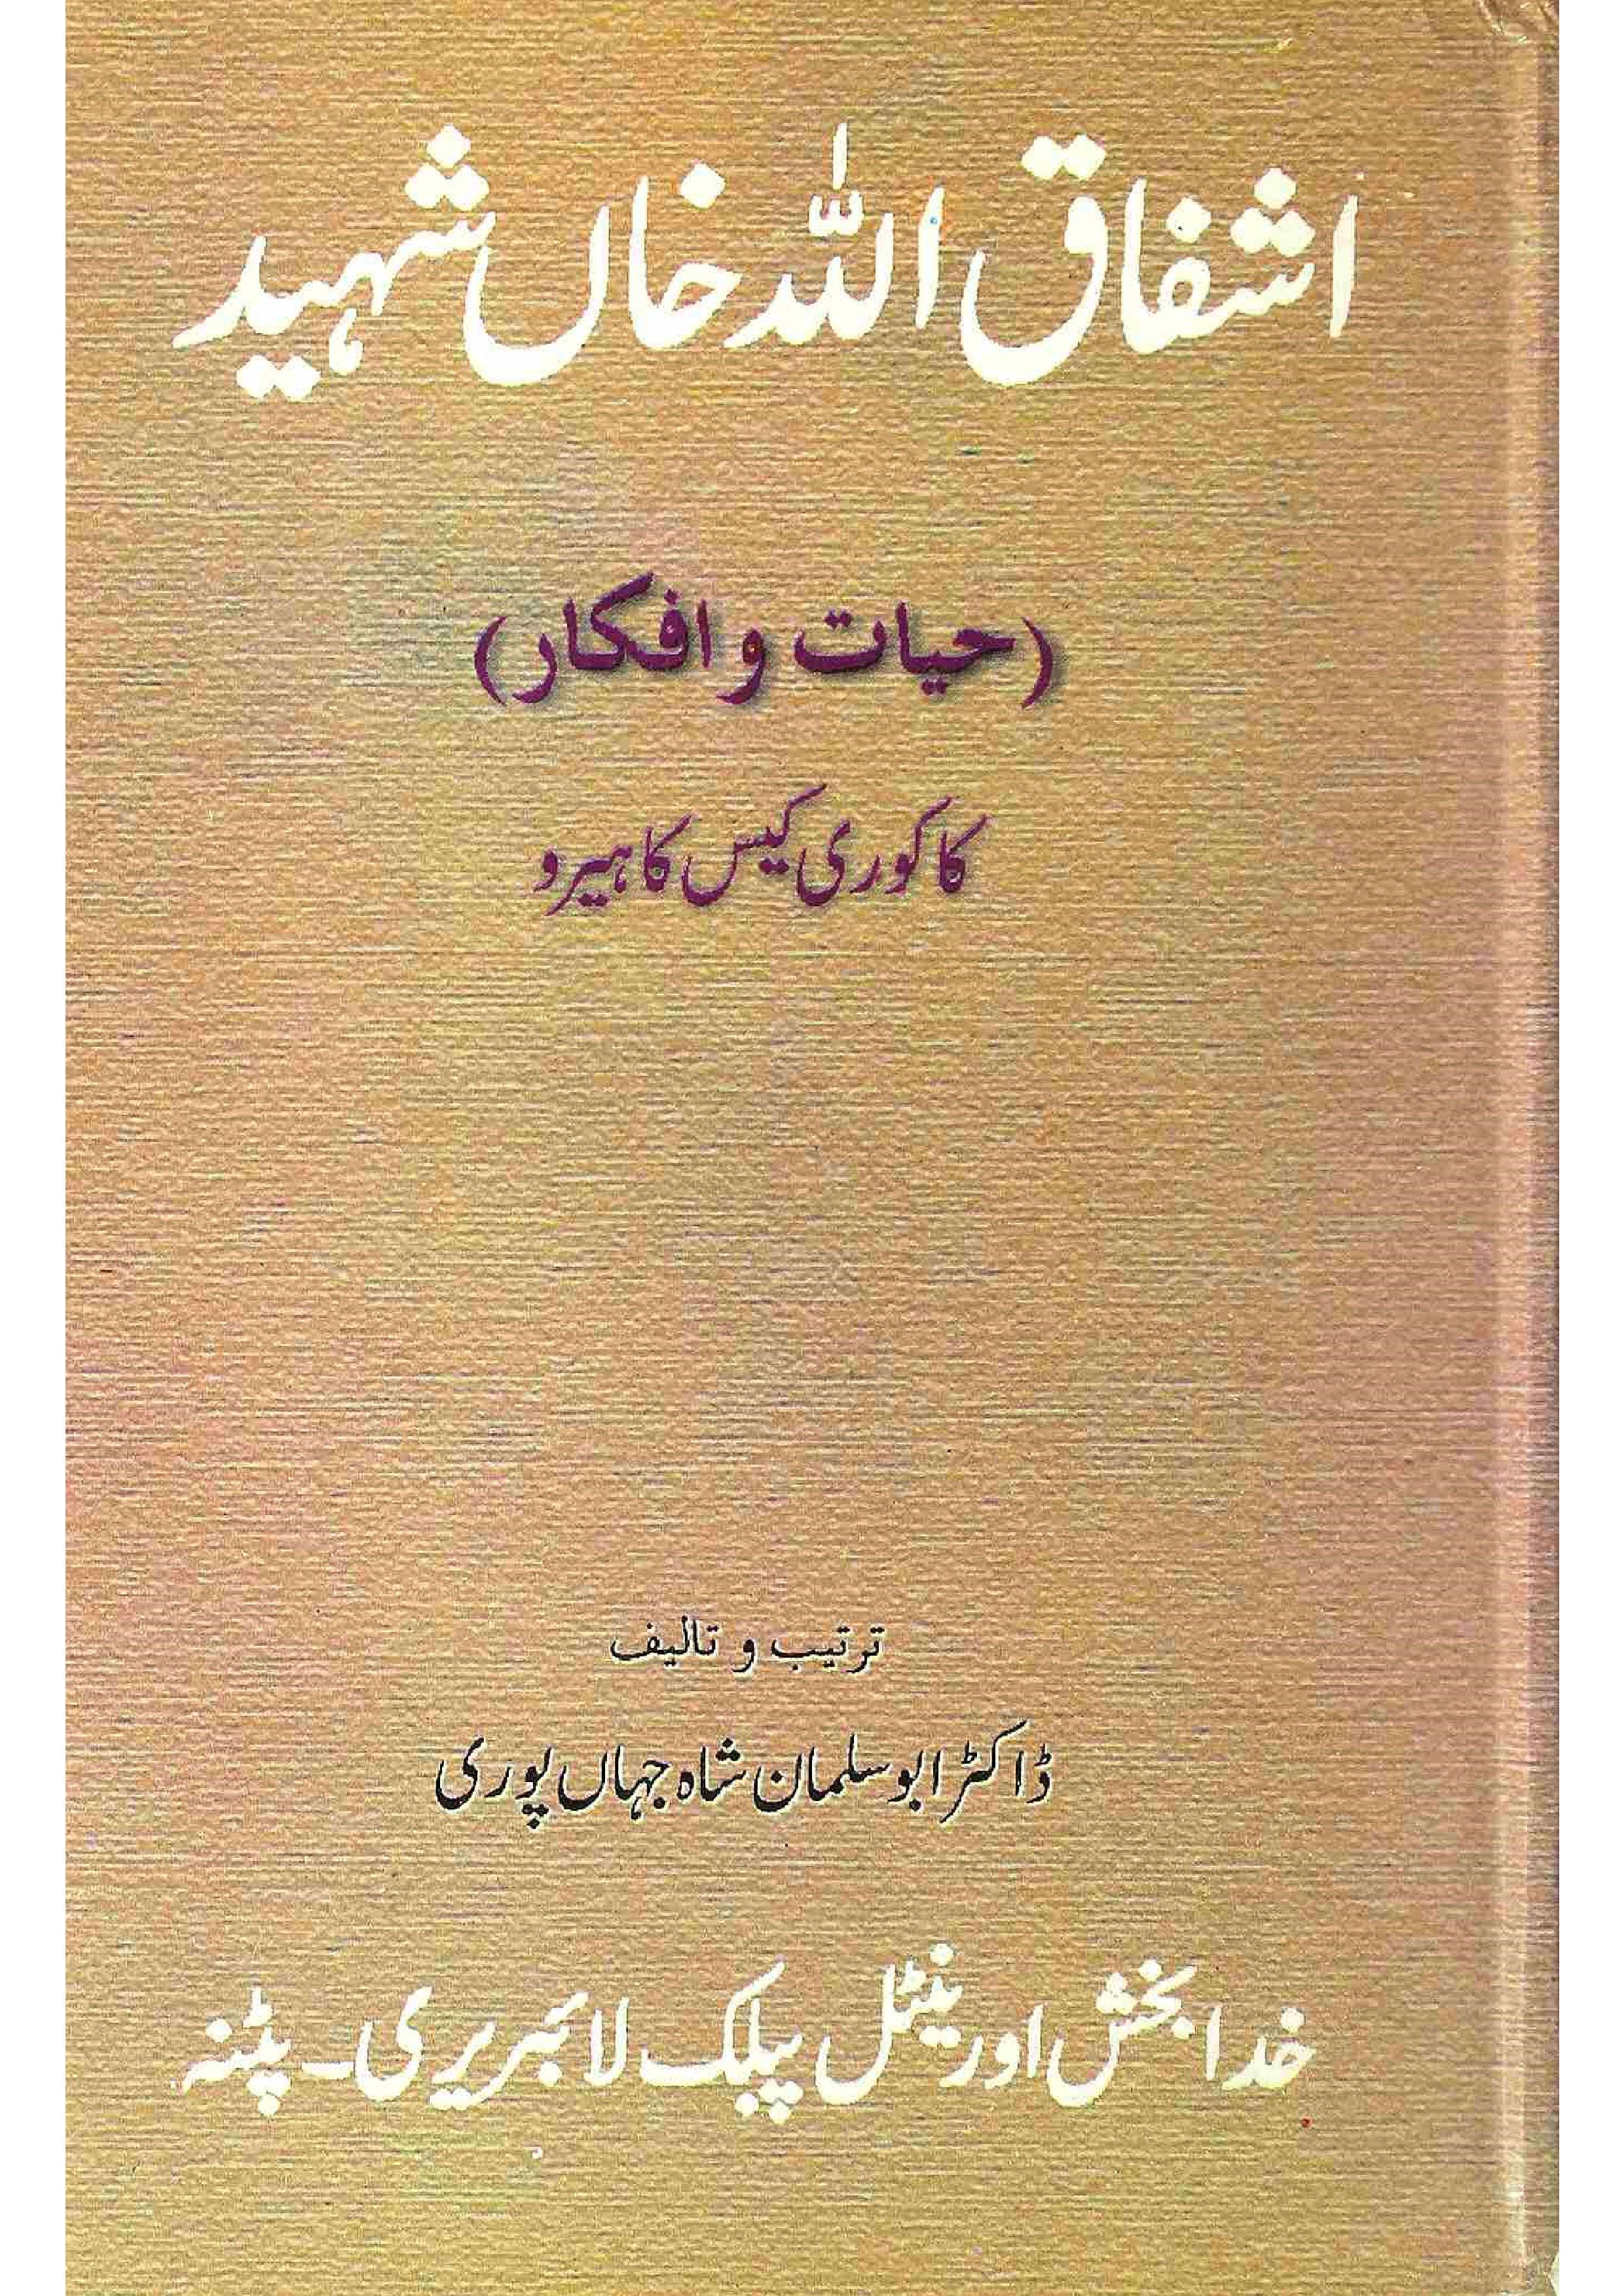 Ashfaqullah Khan Shaheed     (Hayat-o-Afkar)